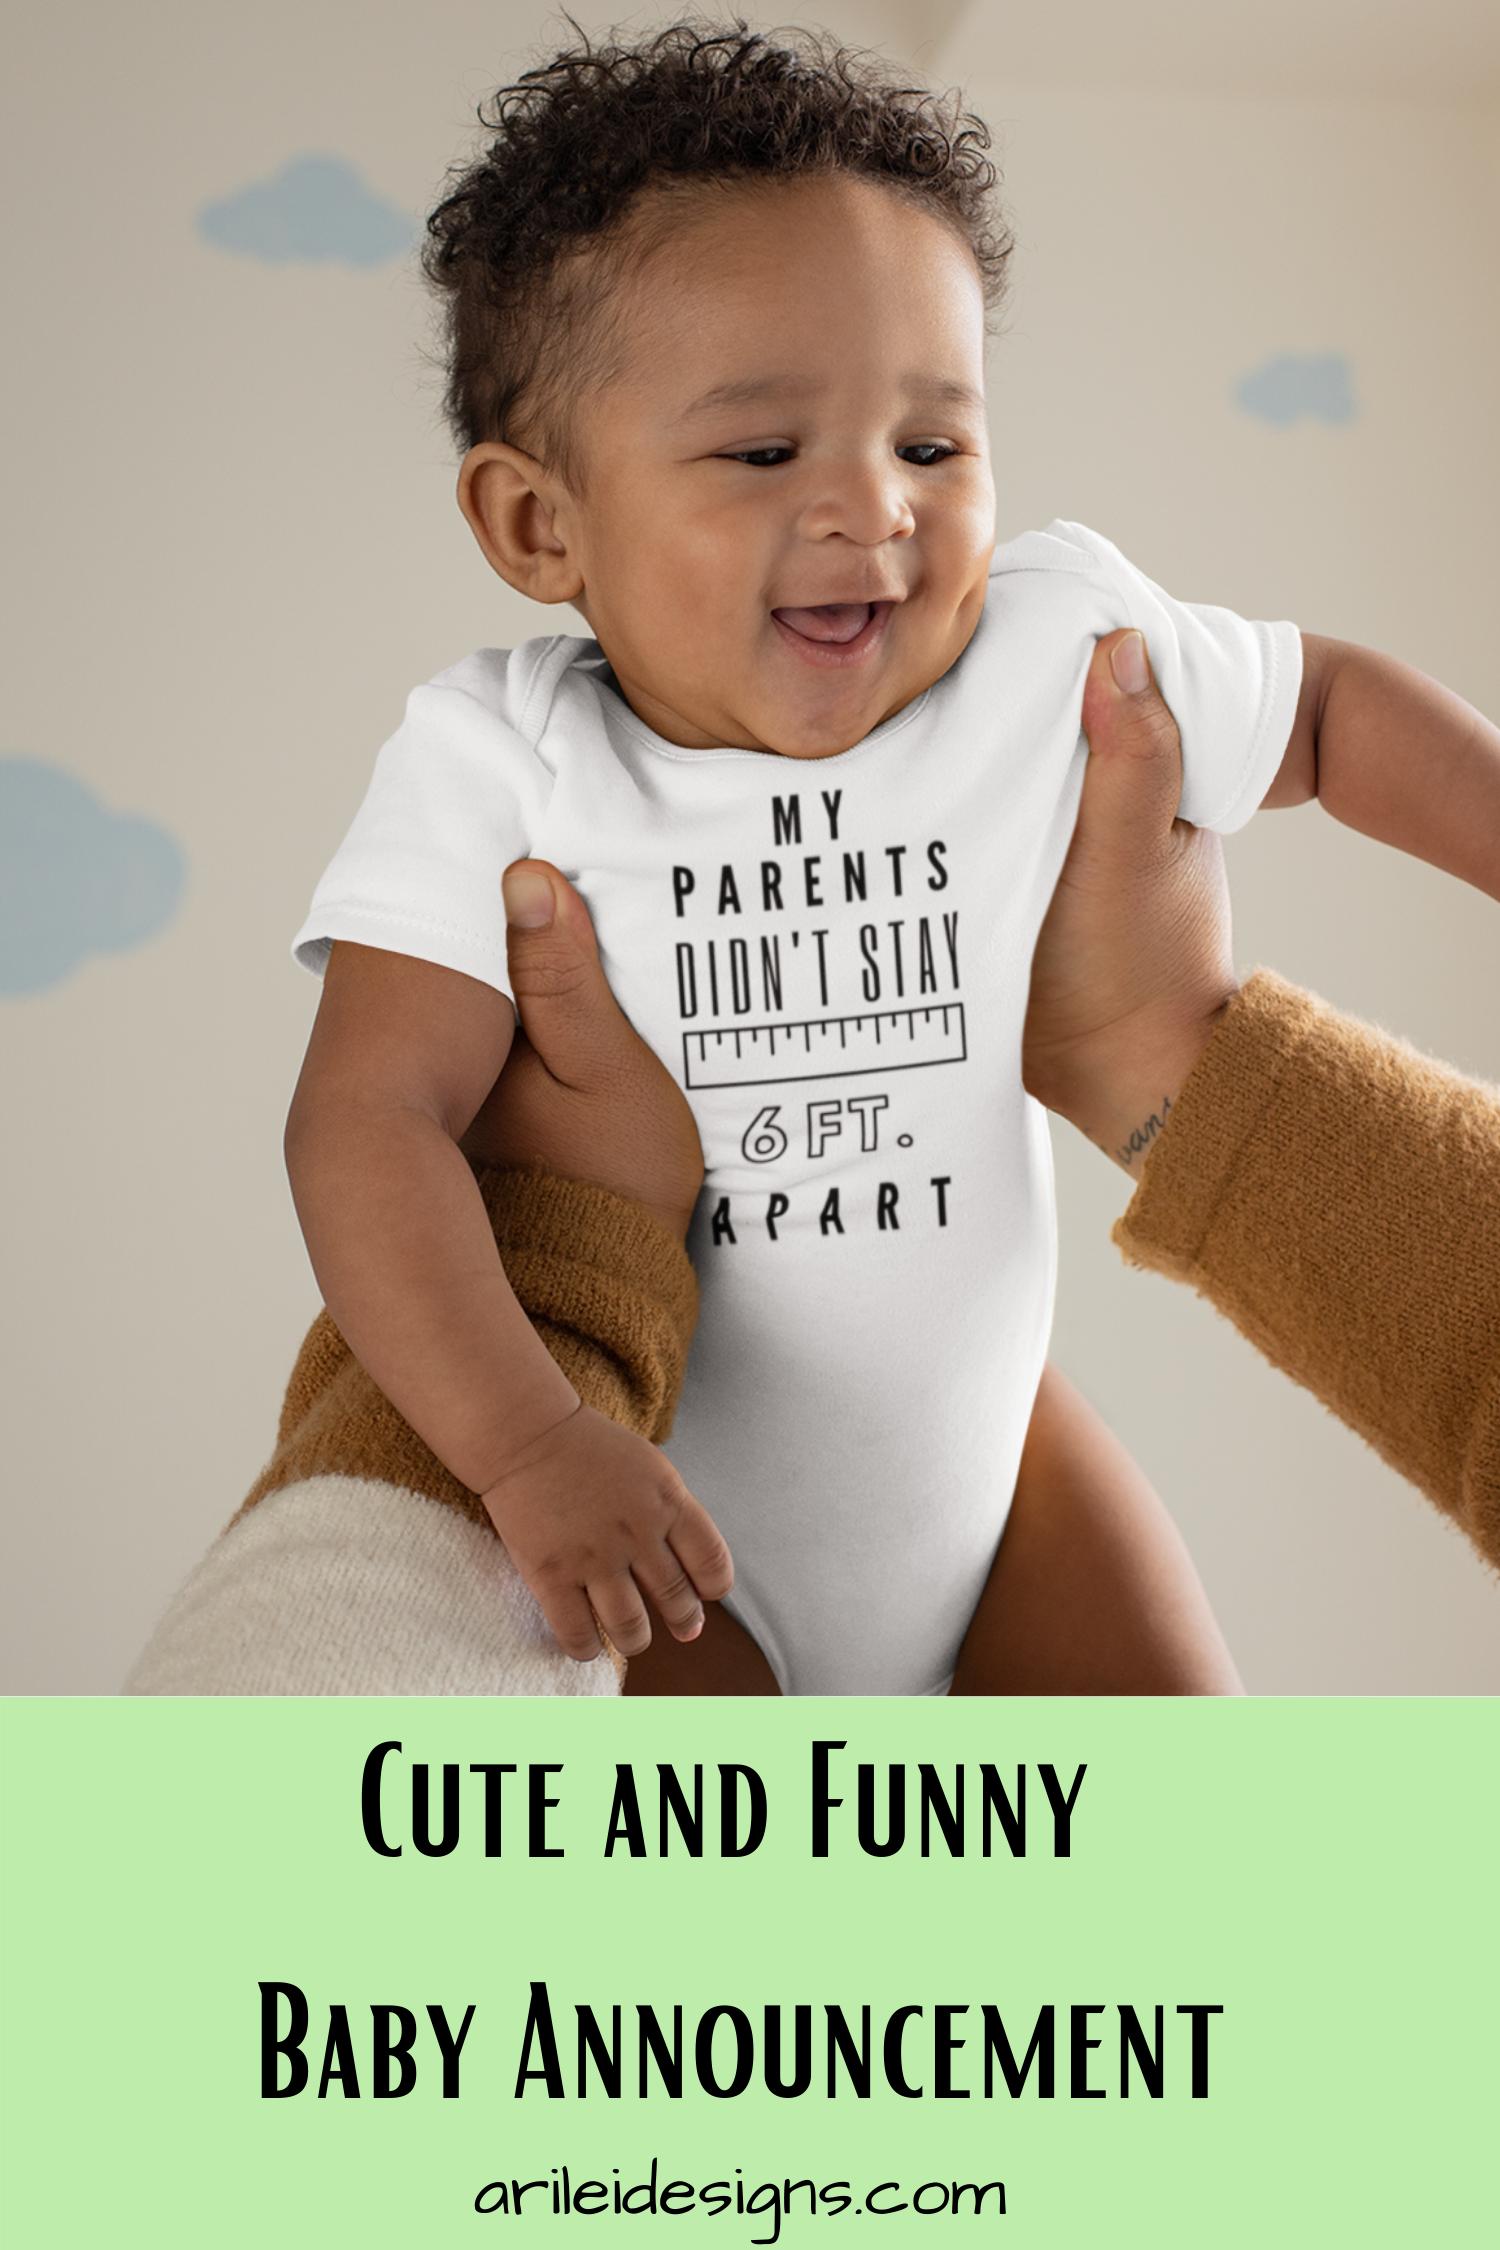 Funny Corona Baby announcement bodysuit 6 ft. Apart-Black Font | Etsy |  Baby announcement, Baby announcement funny, Baby